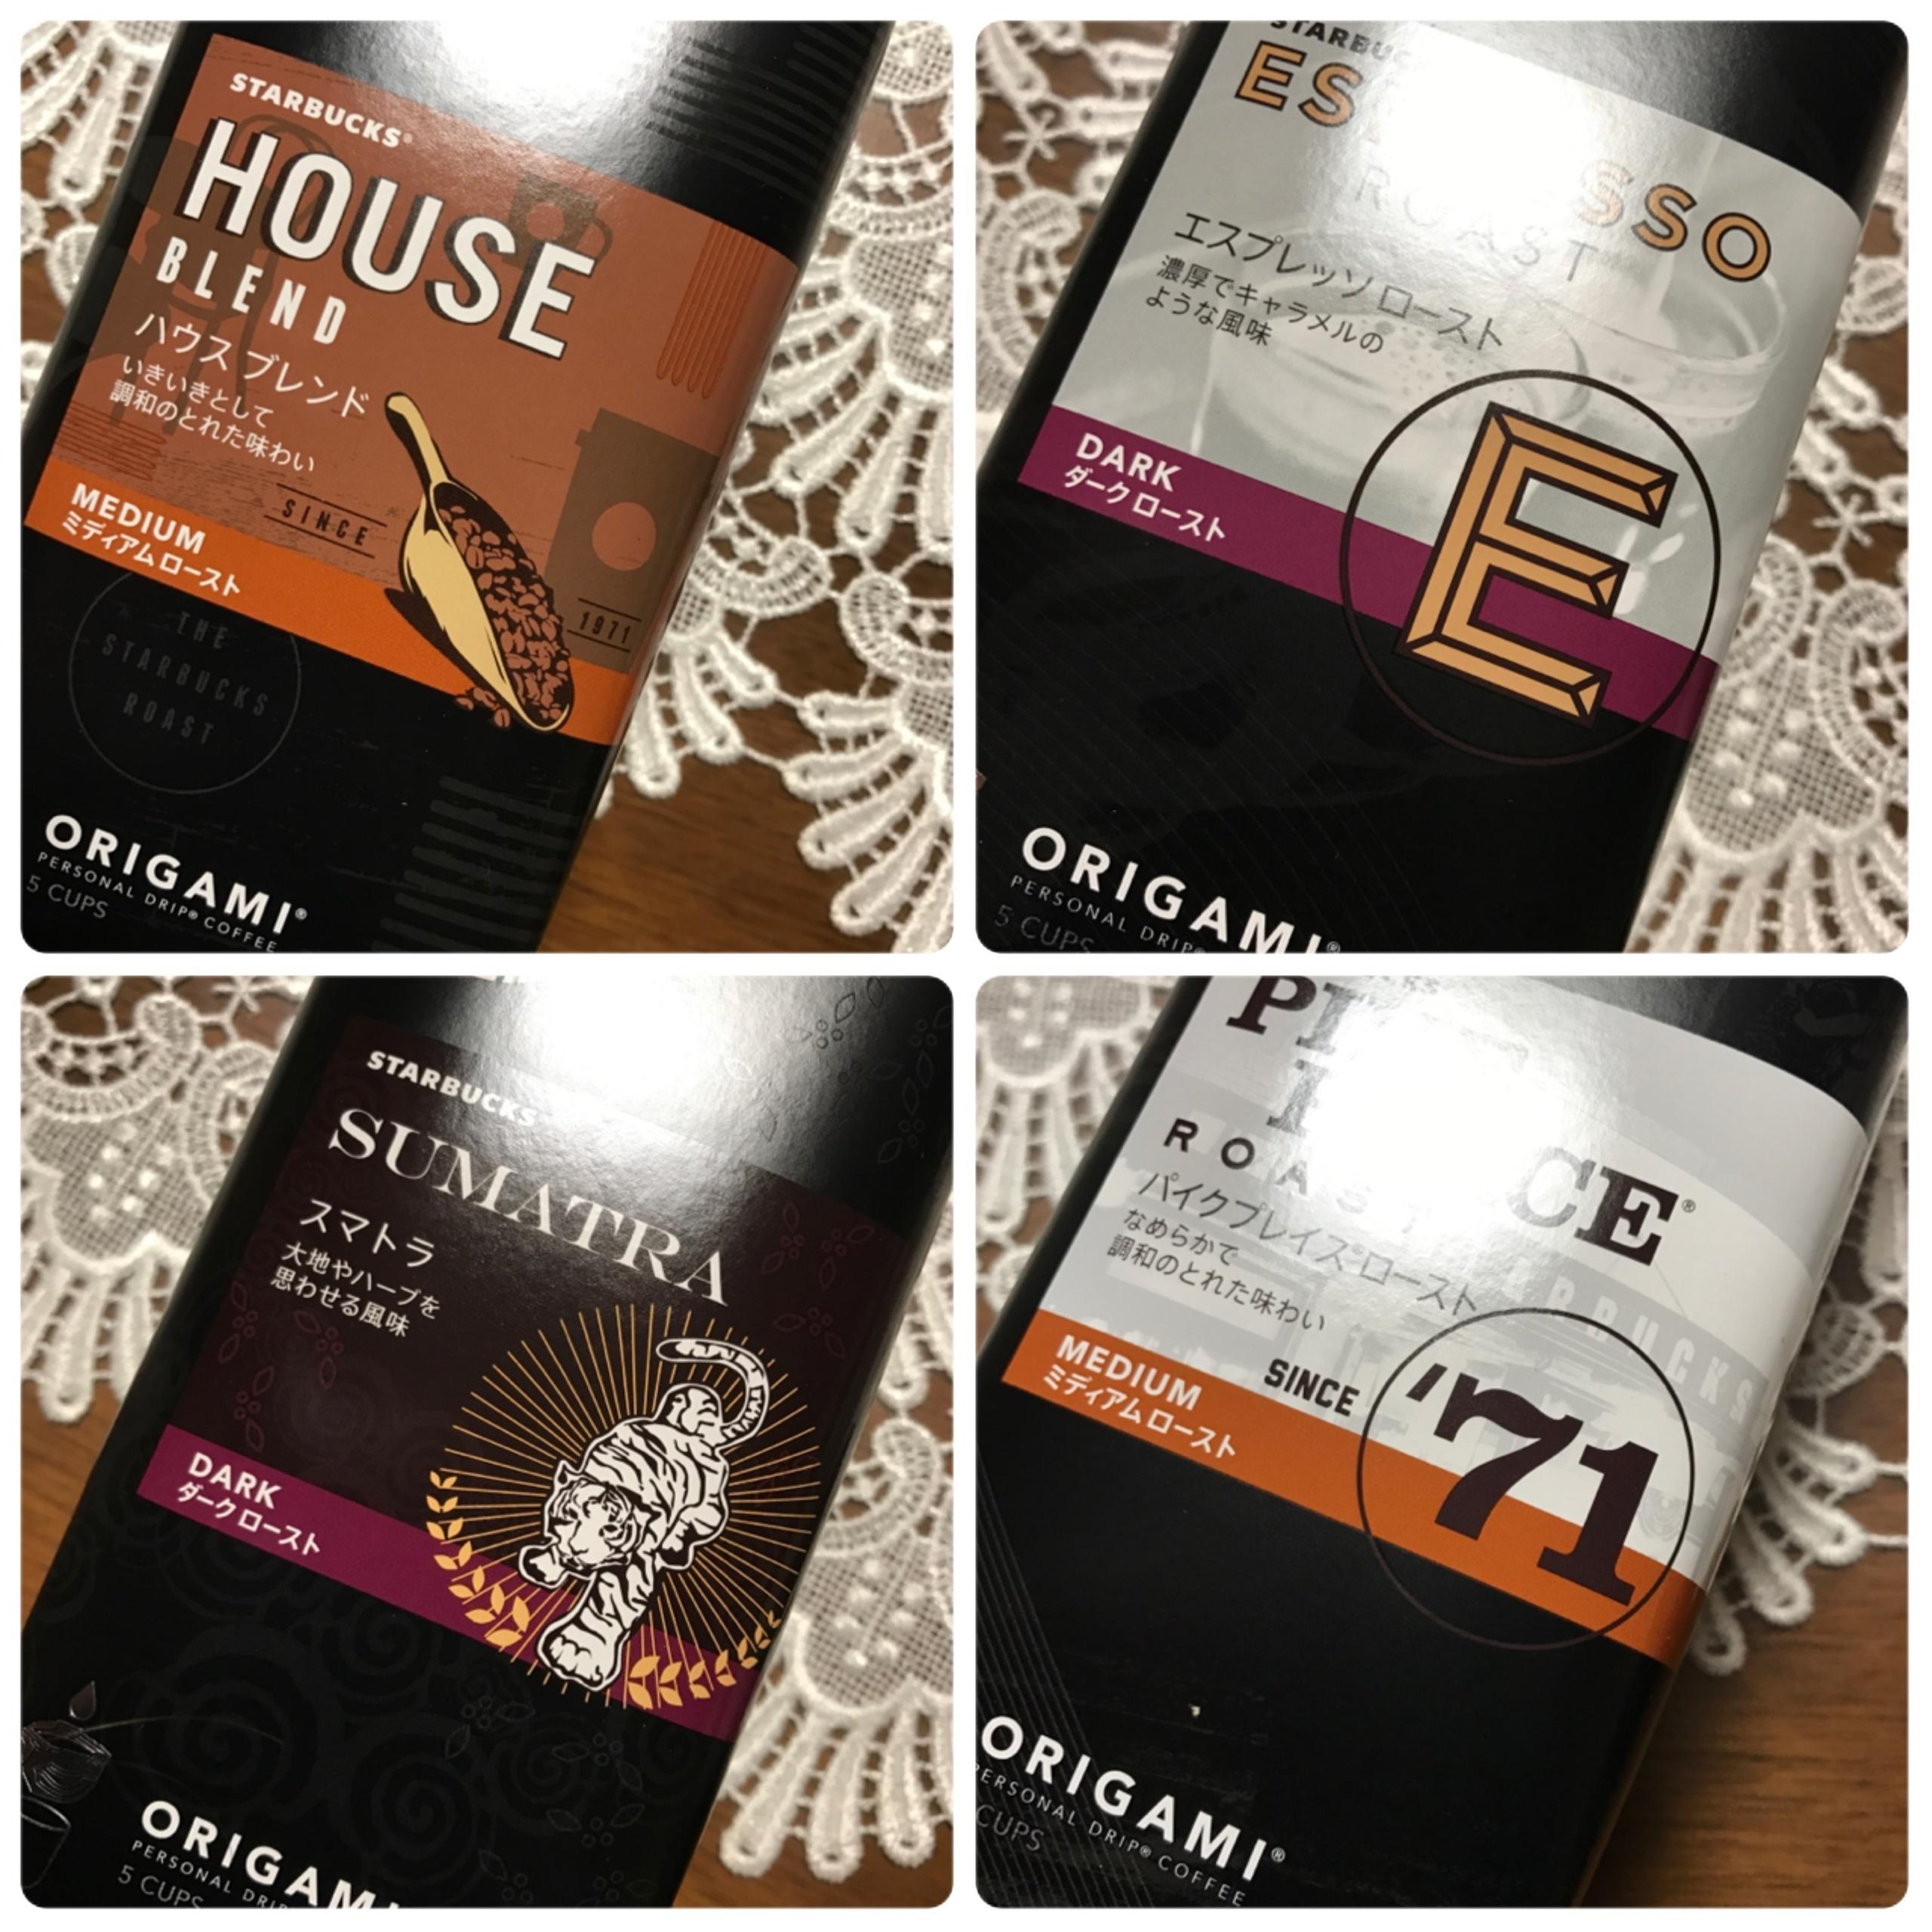 【cafe time】スターバックスのお店を味を気軽に再現!ORIGAMIのすすめ!_2